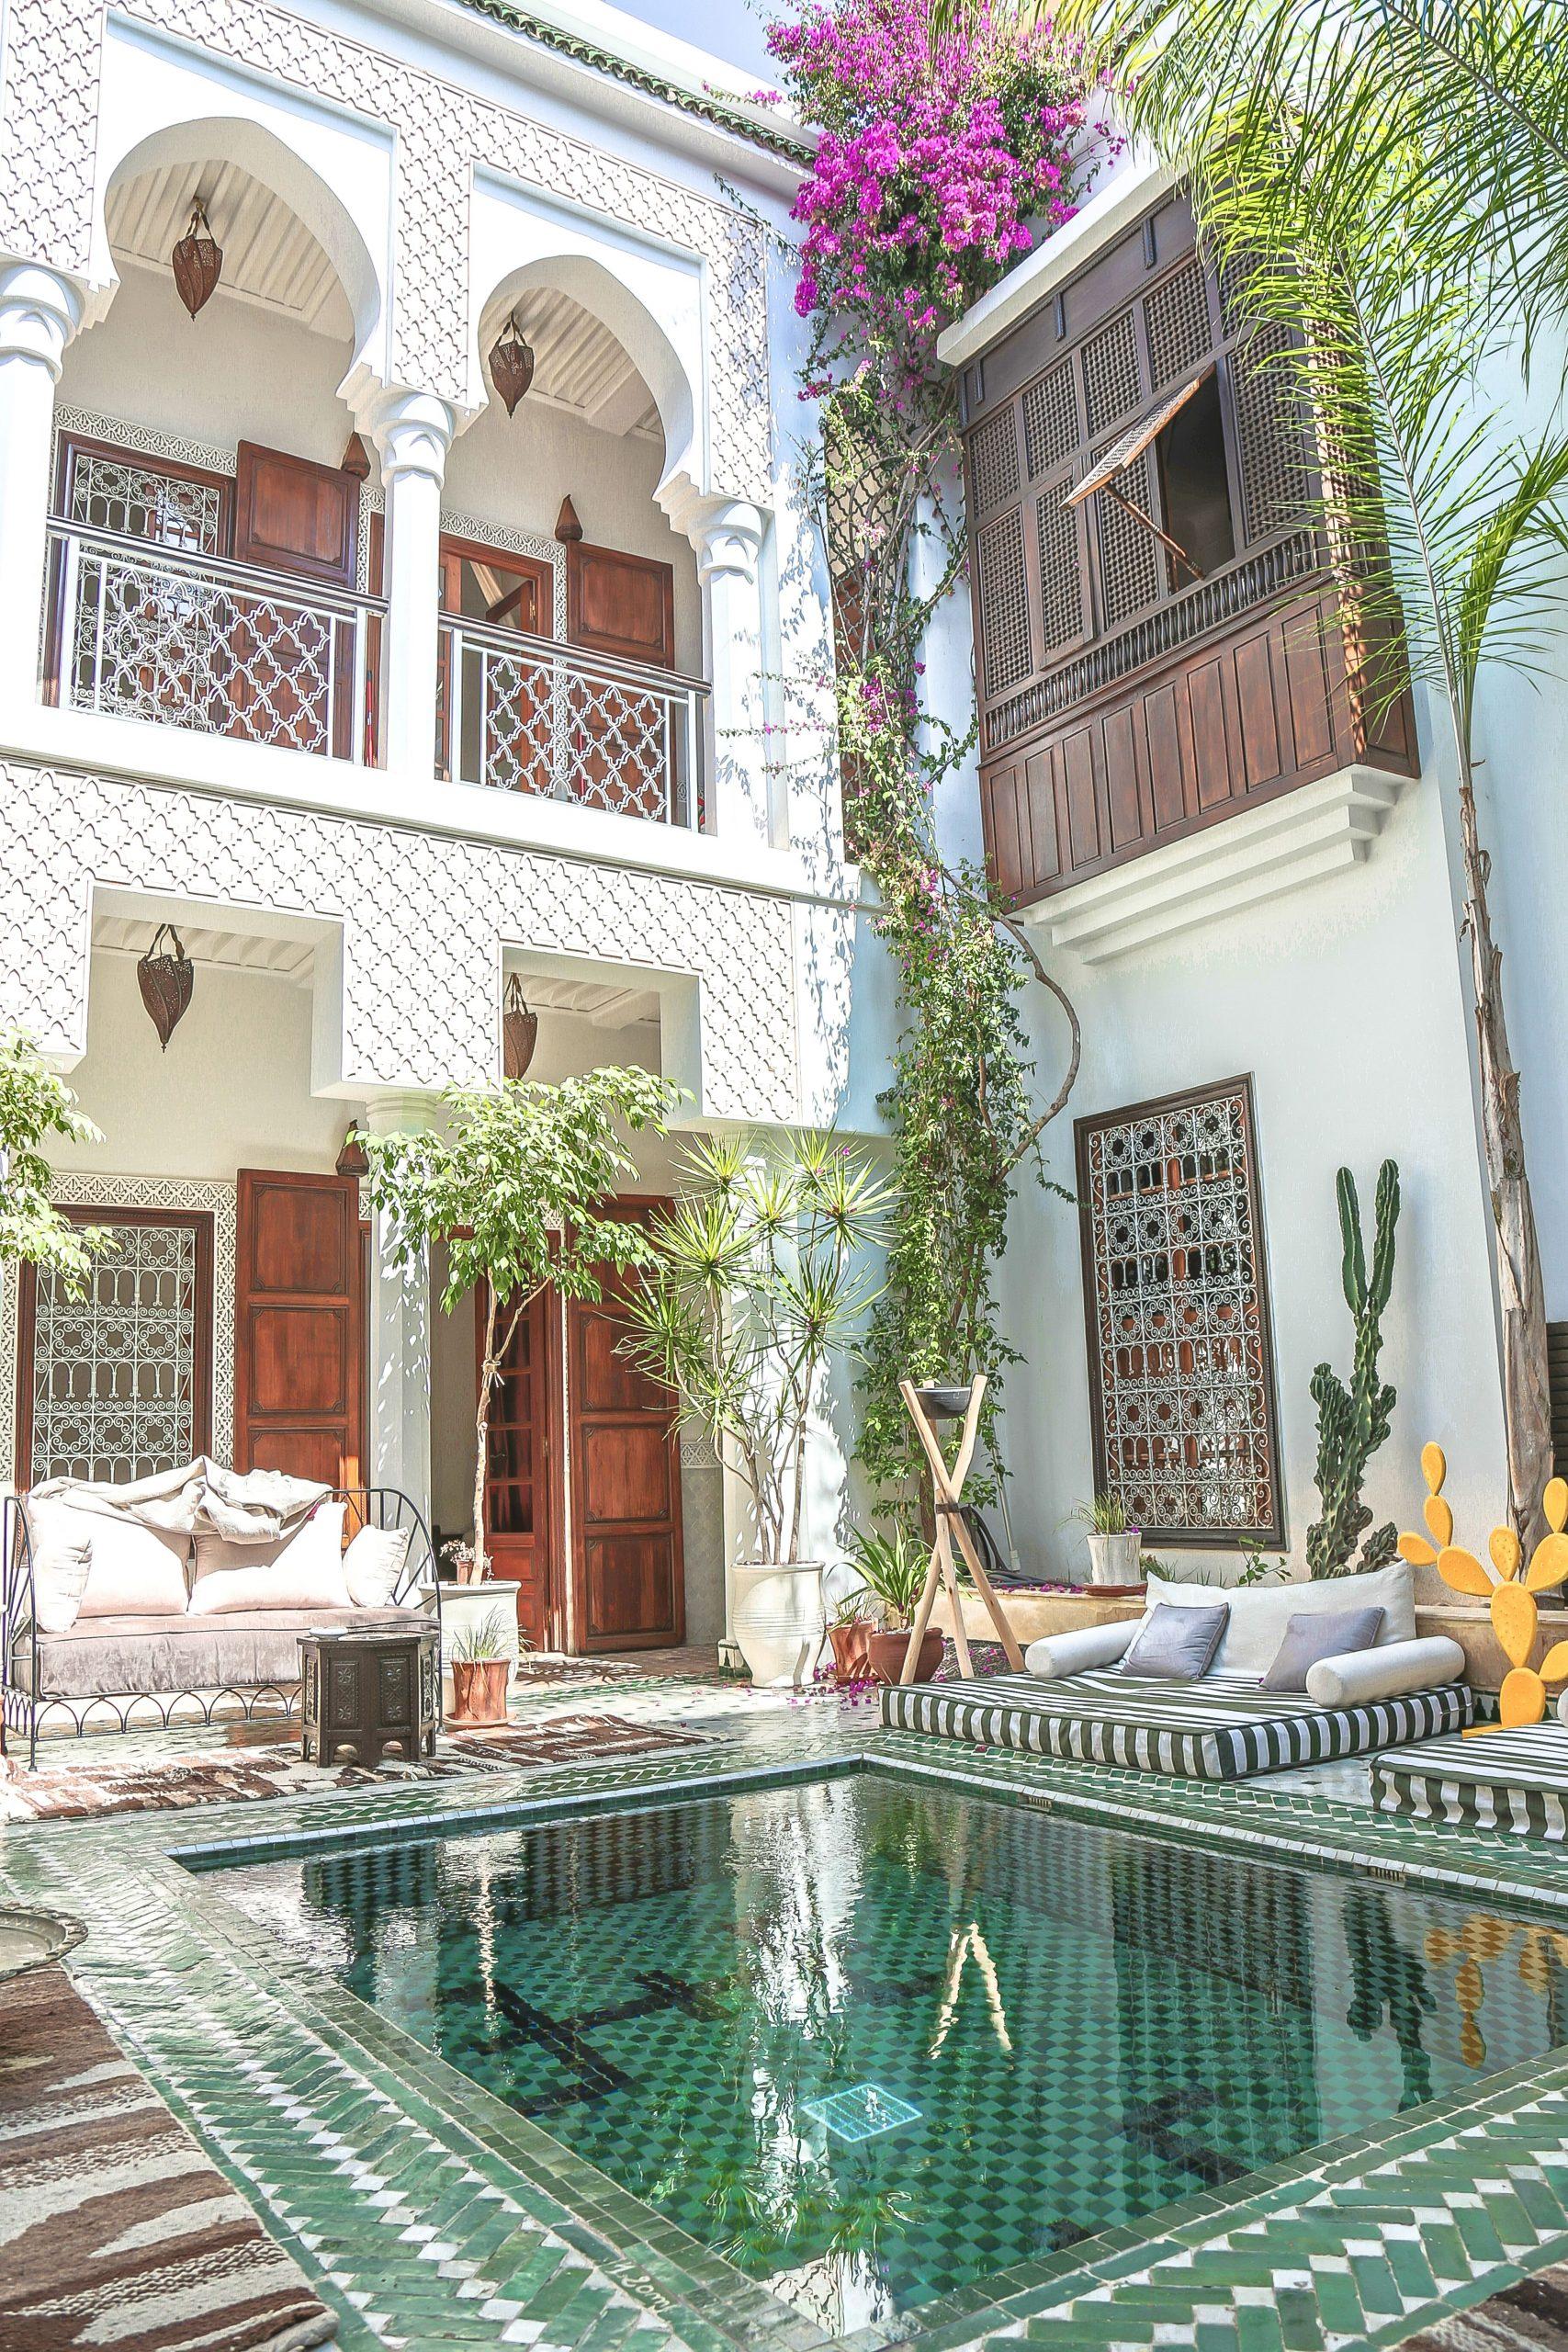 Photos – Riad Yasmine Morocco   Mimari, Mimari Tasarım Ve Fas destiné Riad Marrakech Avec Piscine